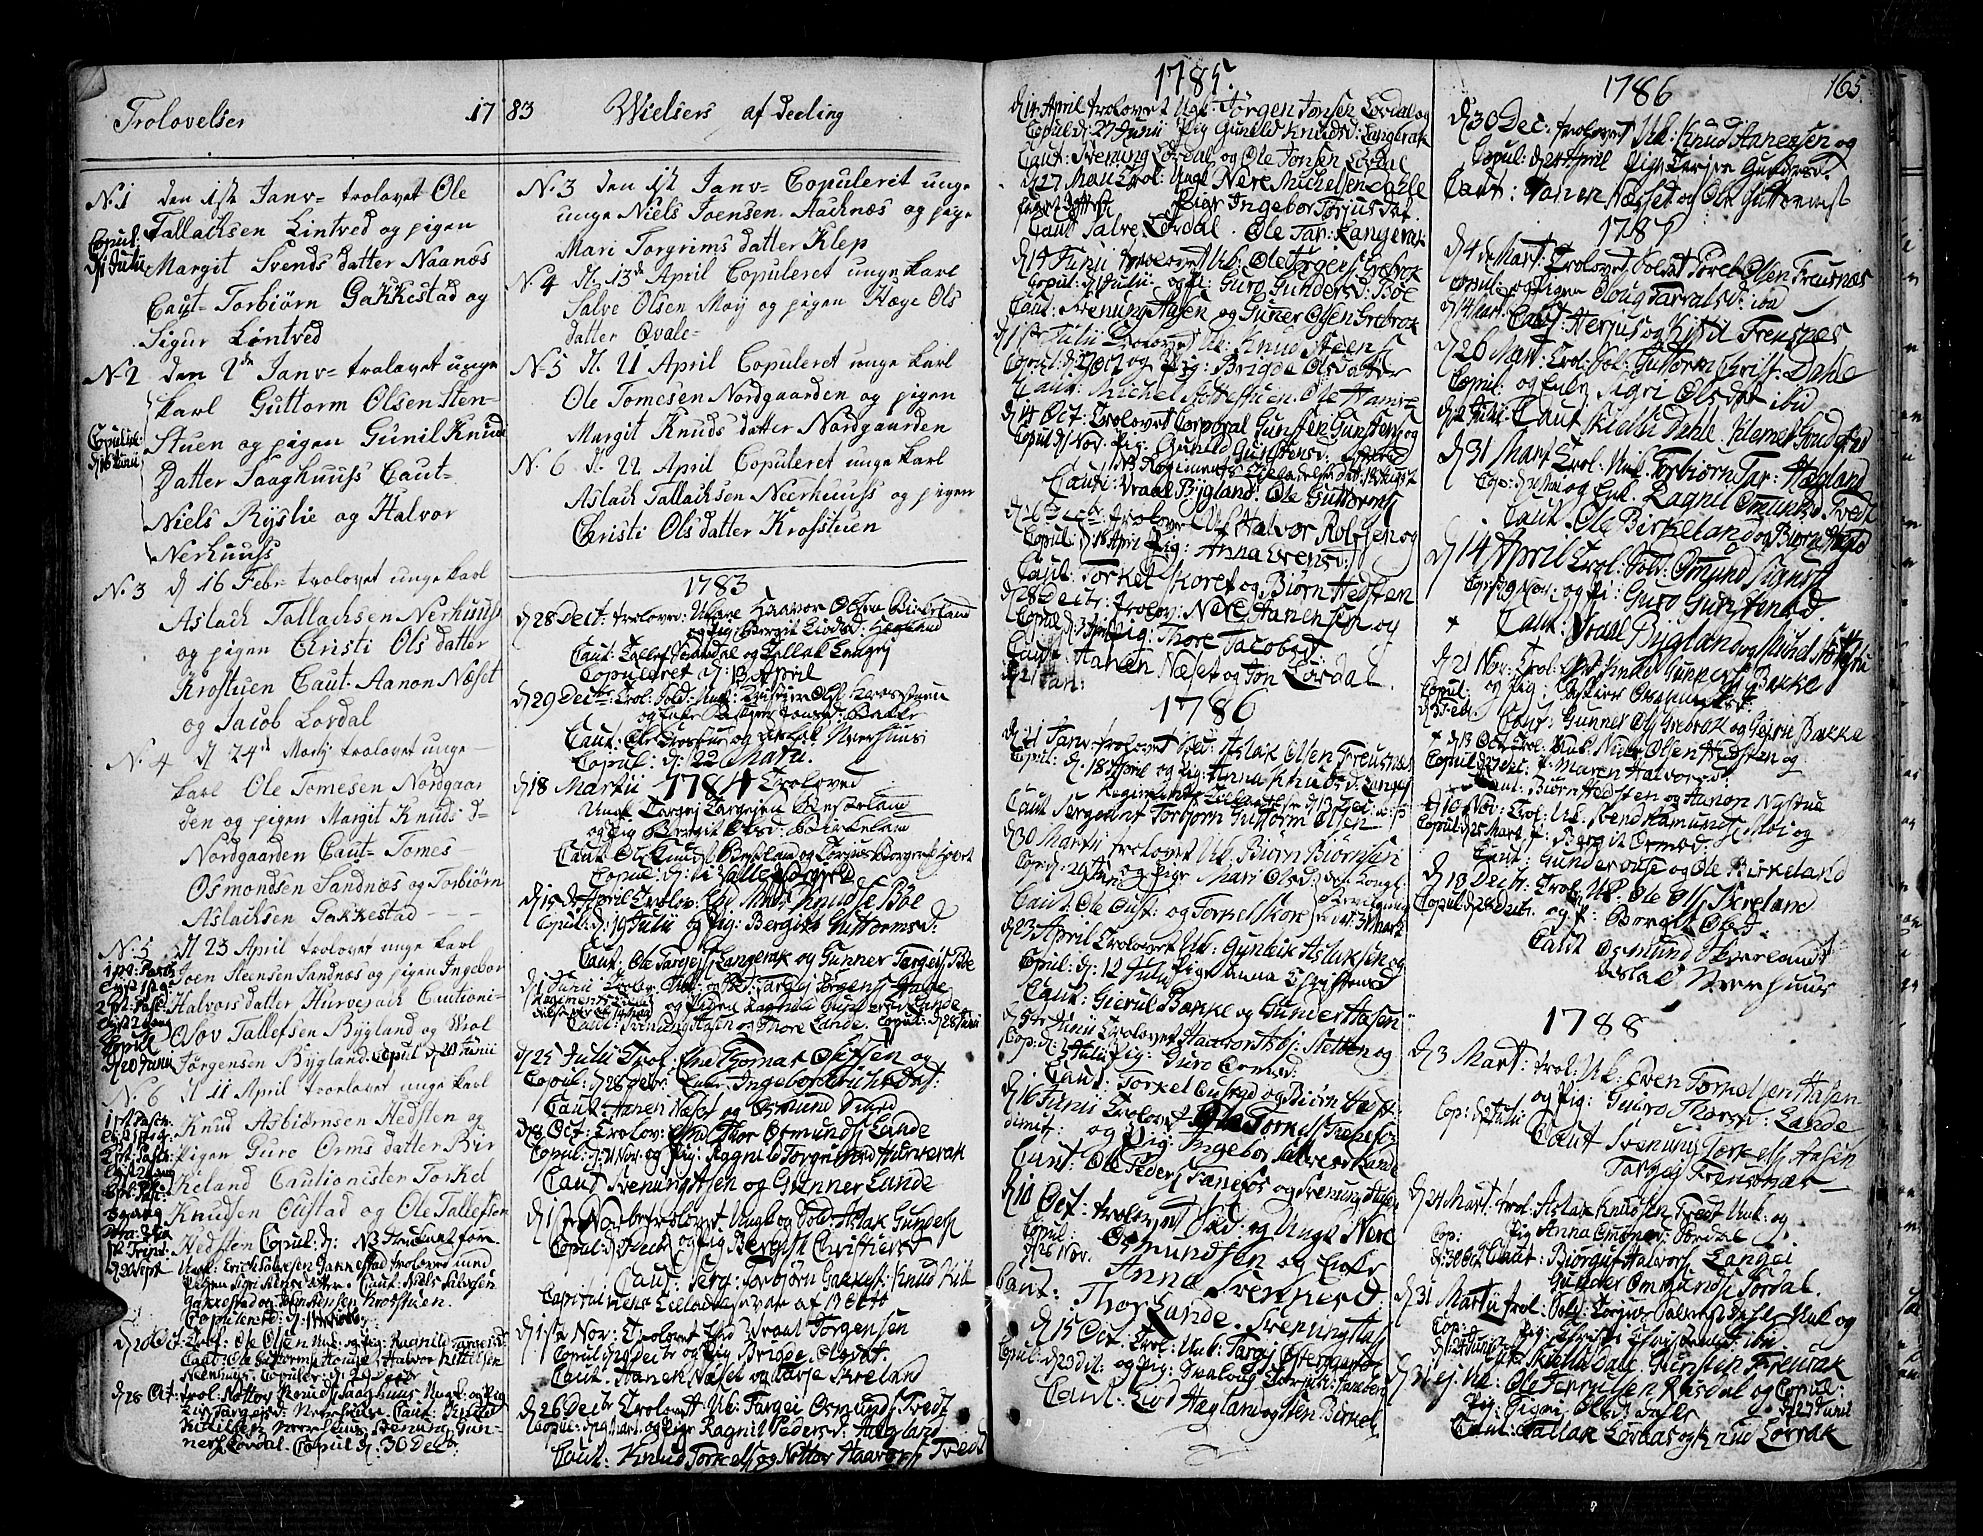 SAK, Bygland sokneprestkontor, F/Fa/Fab/L0002: Ministerialbok nr. A 2, 1766-1816, s. 165